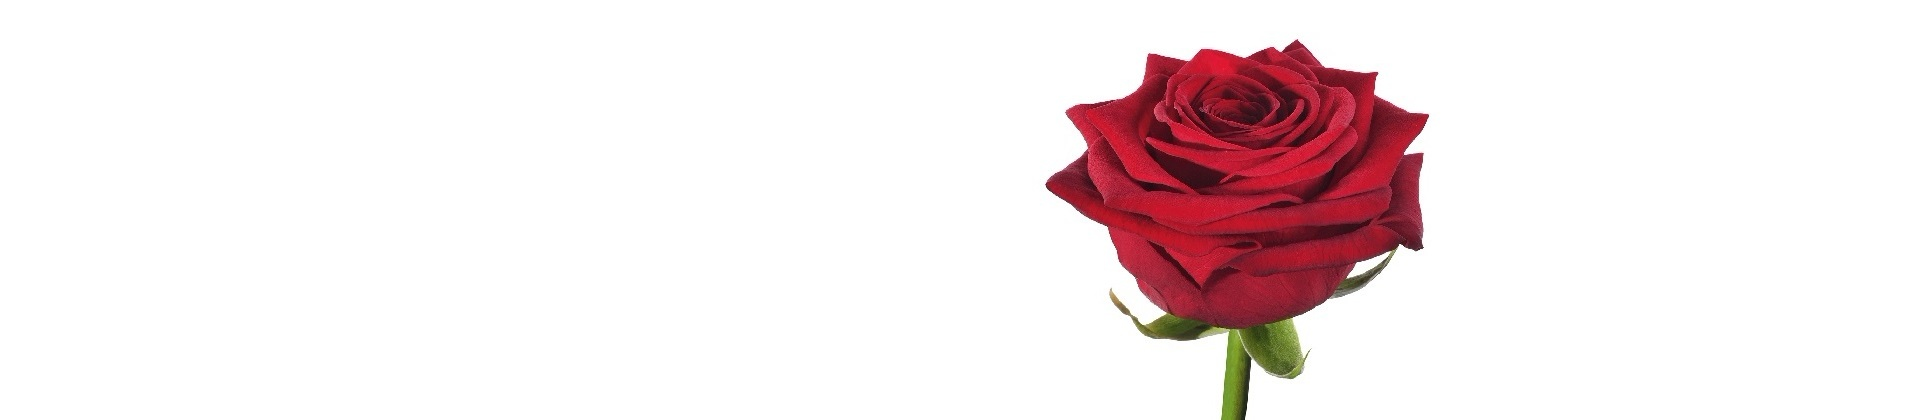 Роза Ред Наоми по супер цене